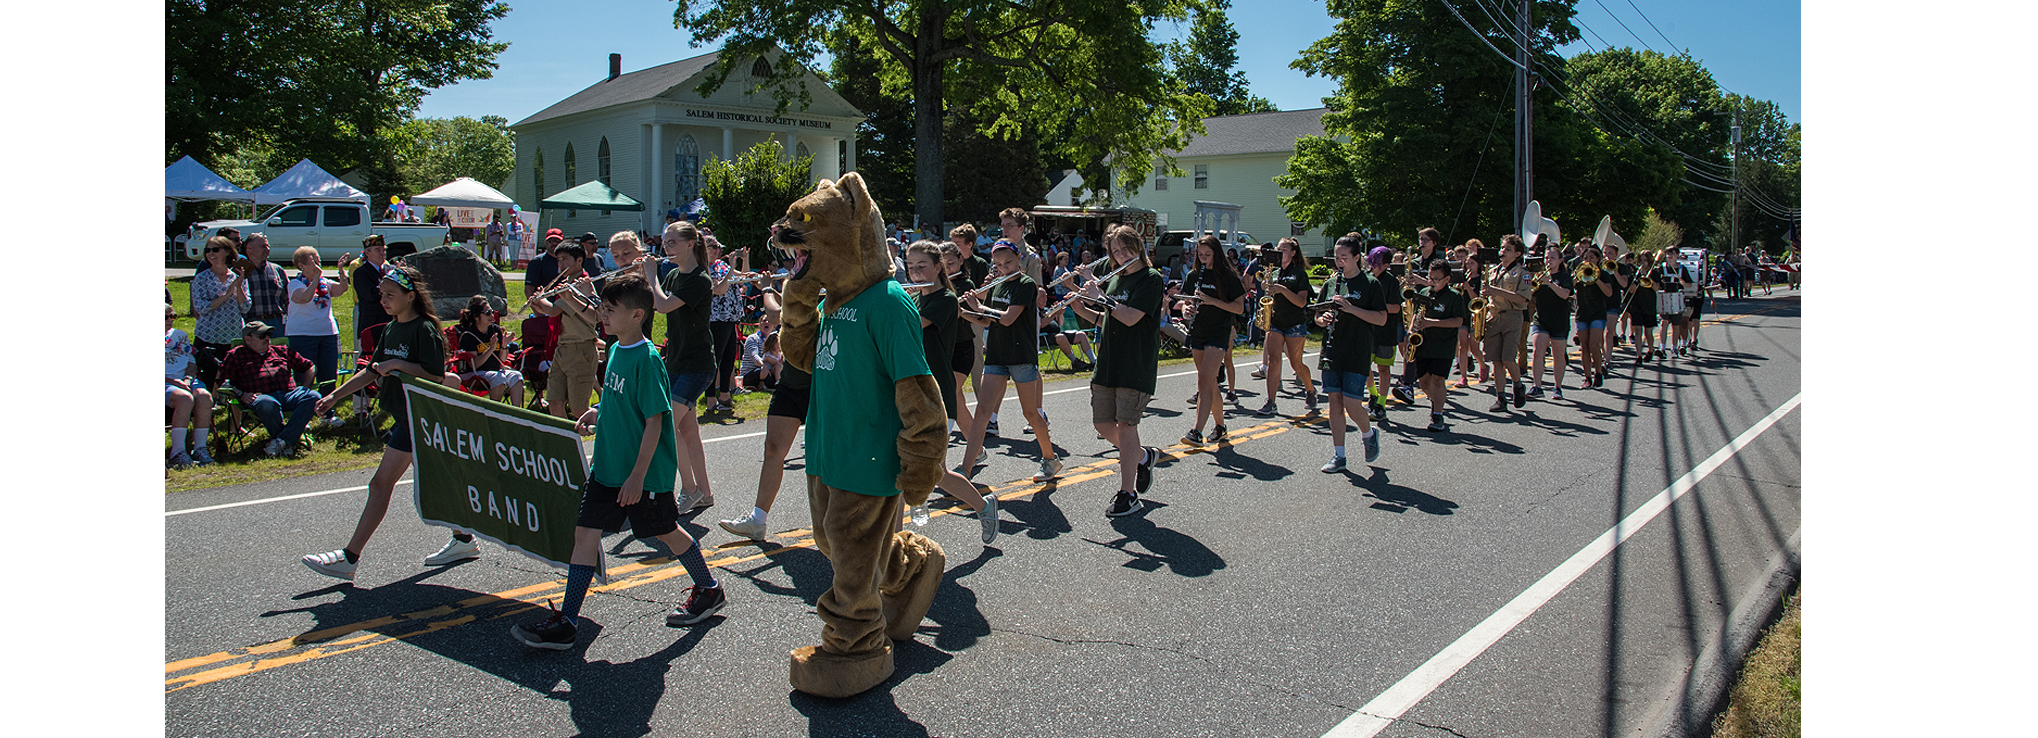 Salem School Marching Band